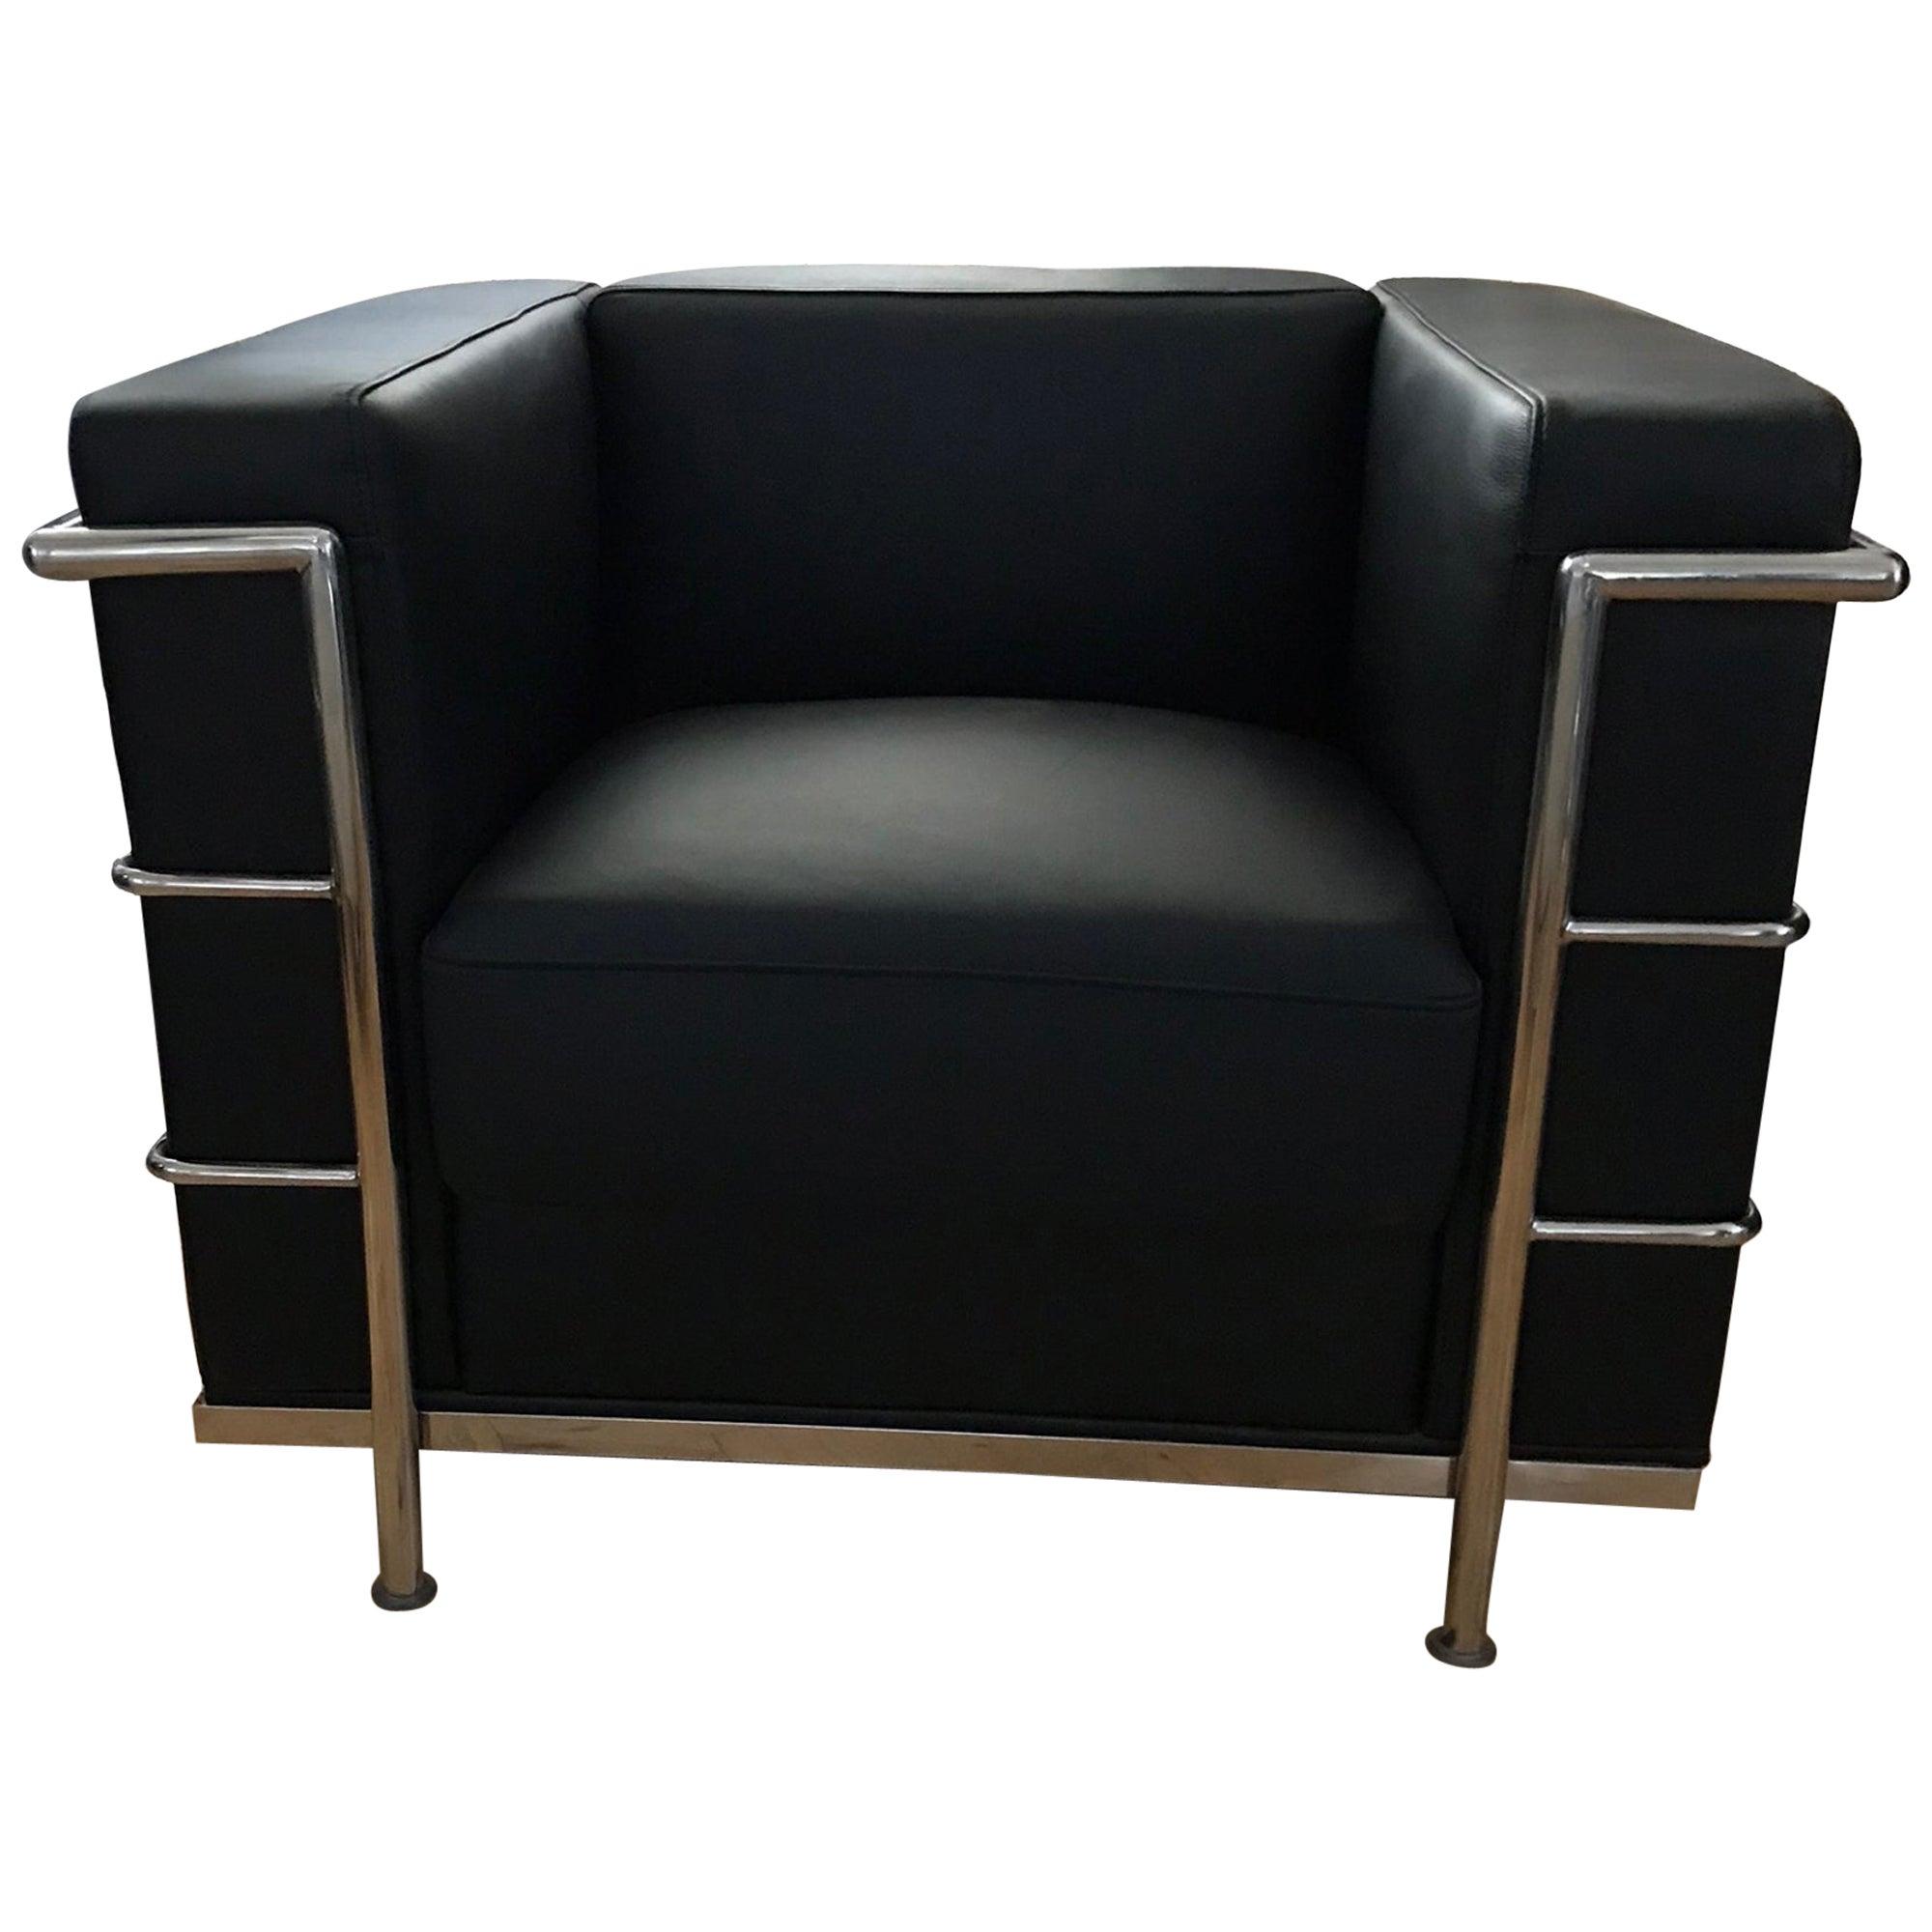 Modern Le Corbusier Design LC2 Armchair Classic Black Leather Cubed Chrome Frame